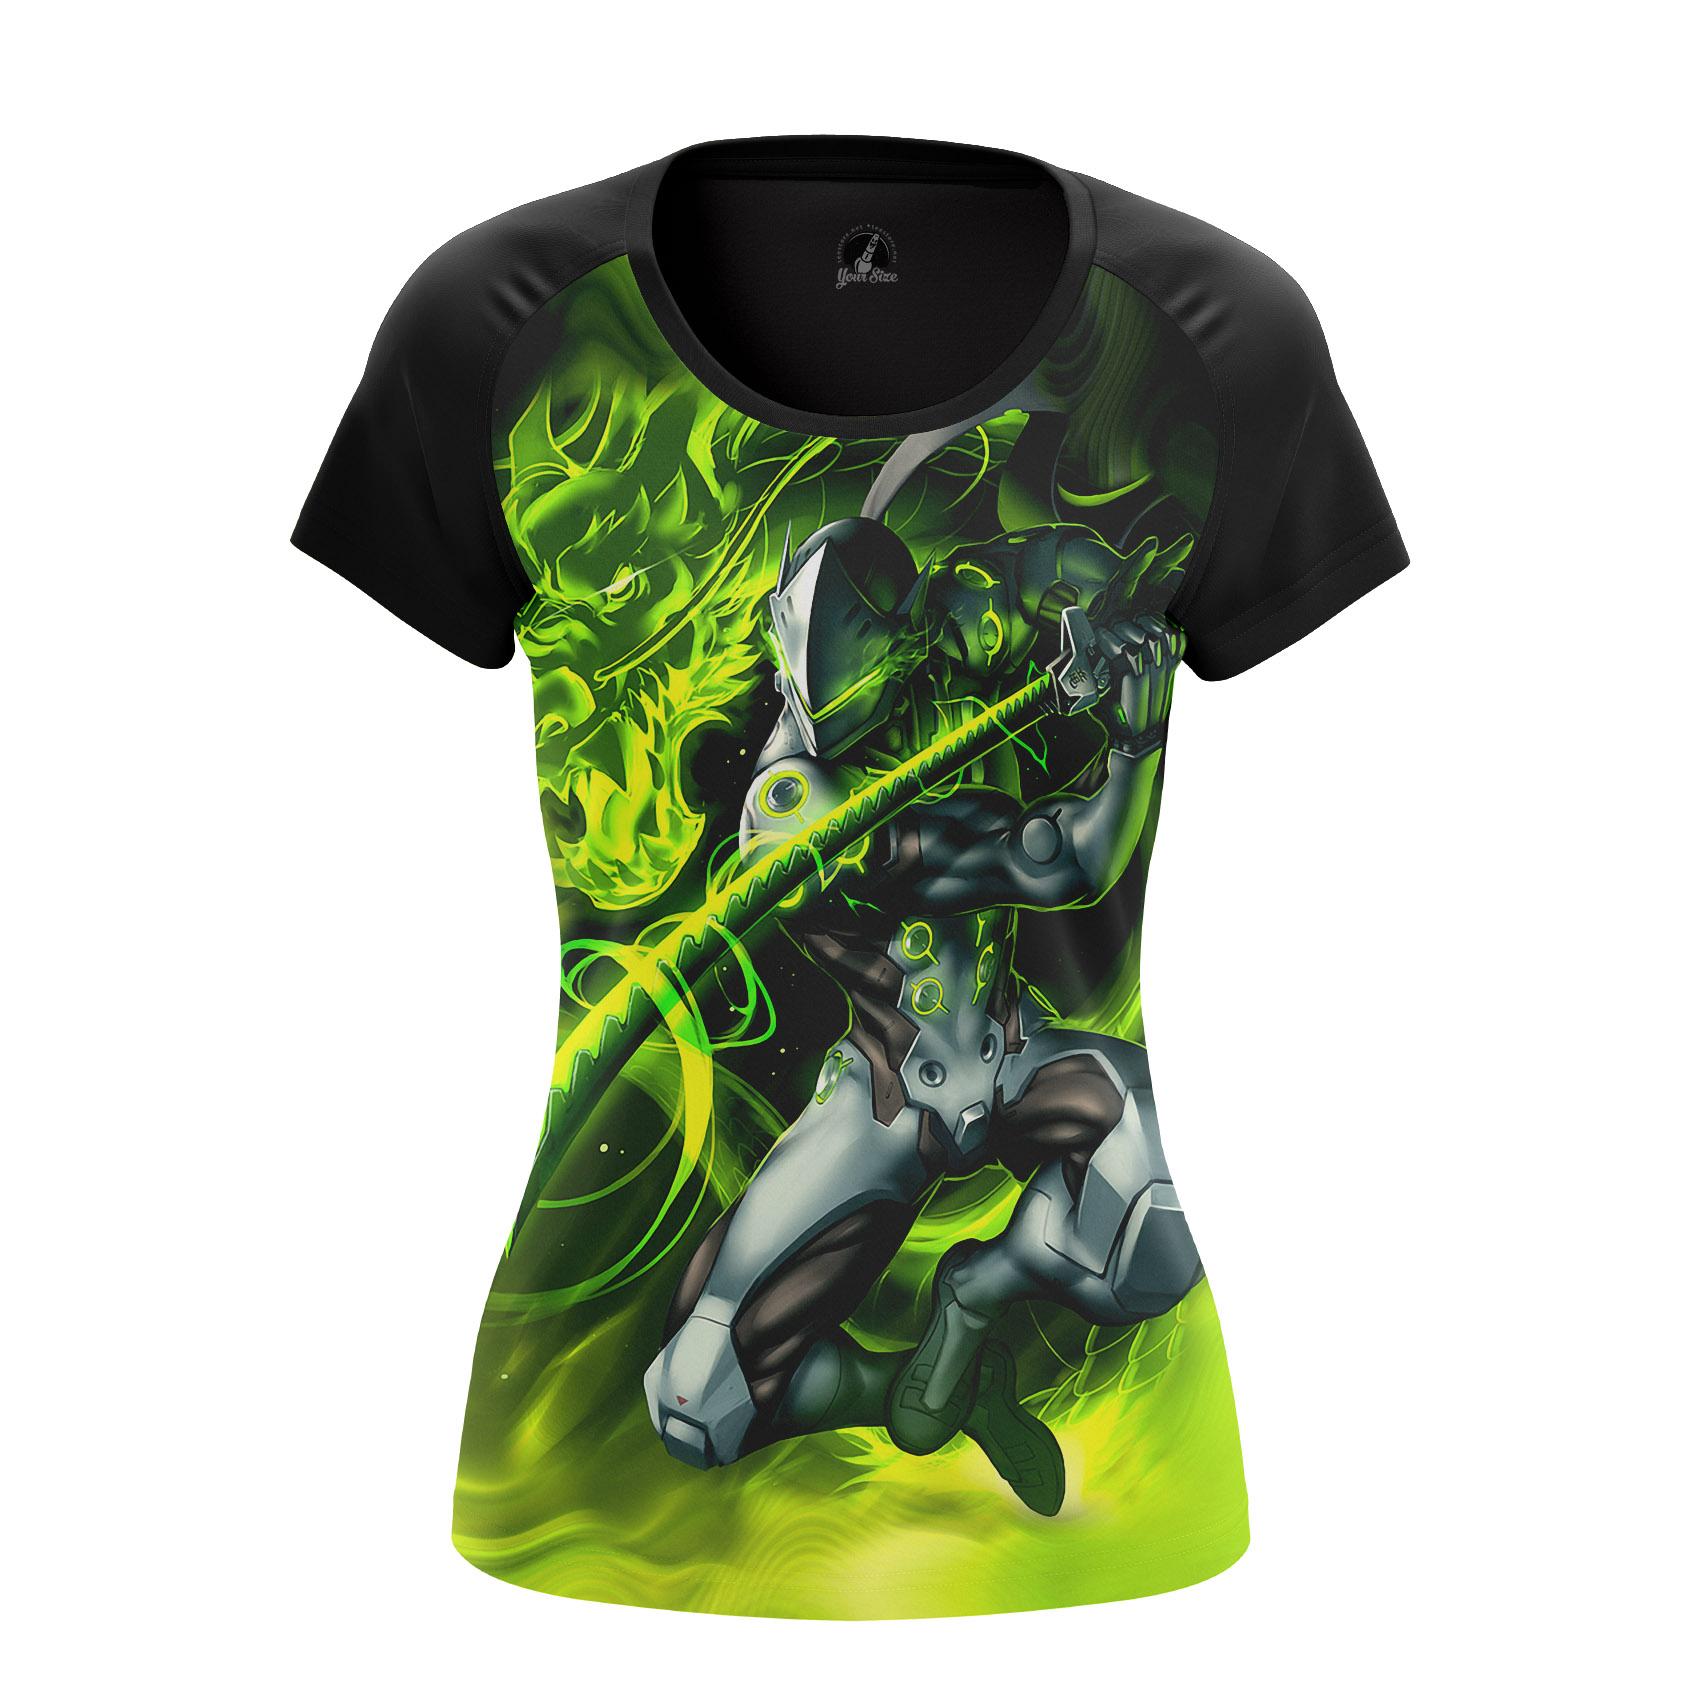 Merchandise Women'S Raglan Genji Overwatch Gaming